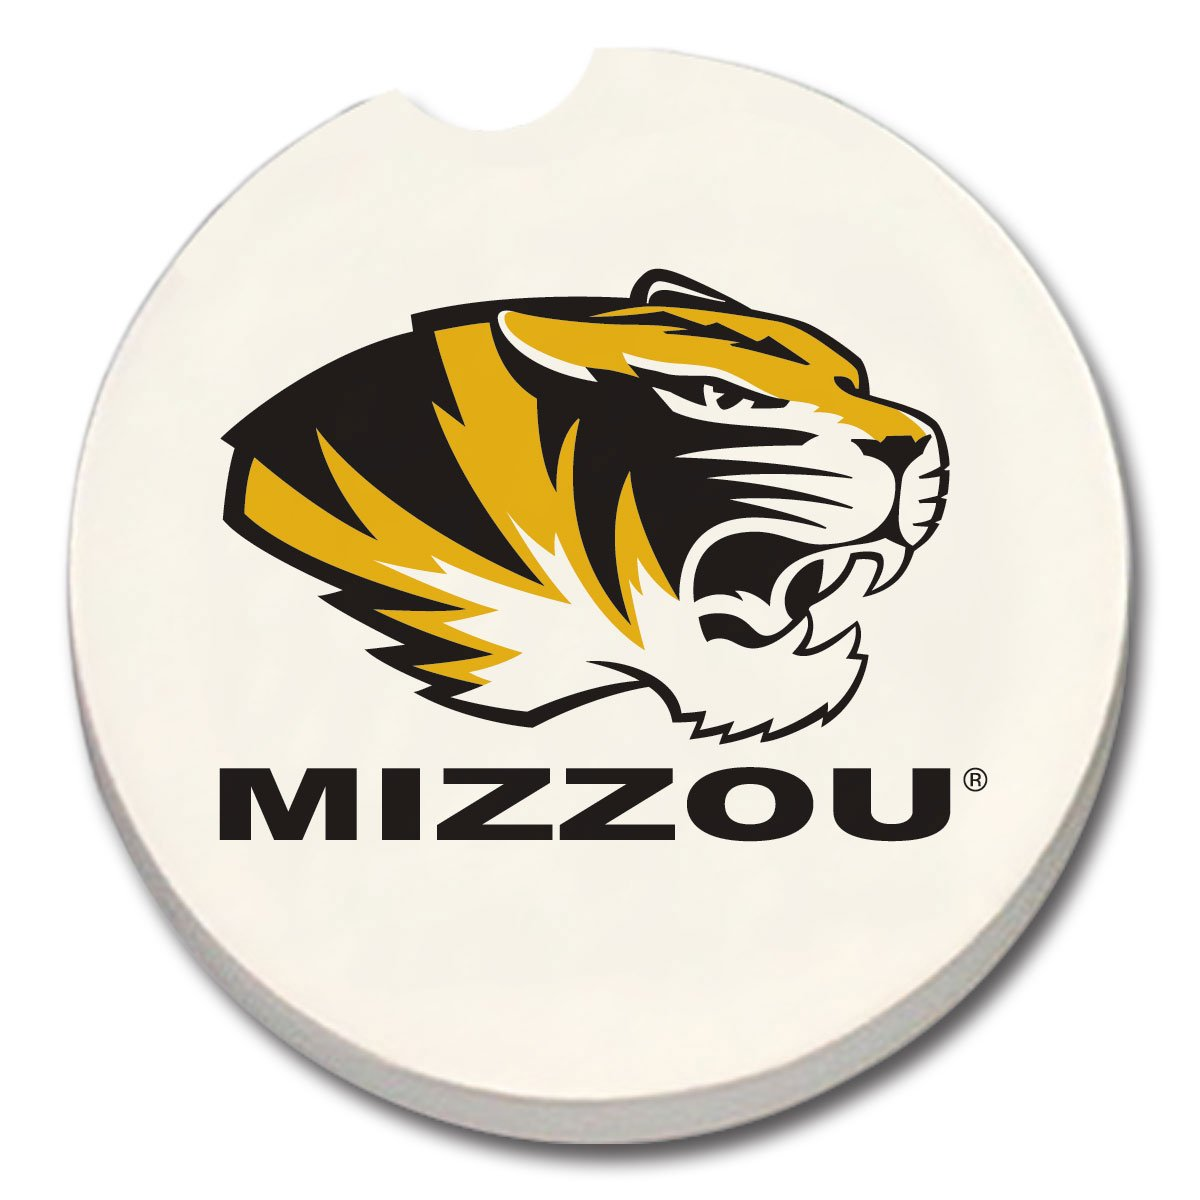 NCAA Missouri Tigers Absorbent Car Coaster 1 COUNT